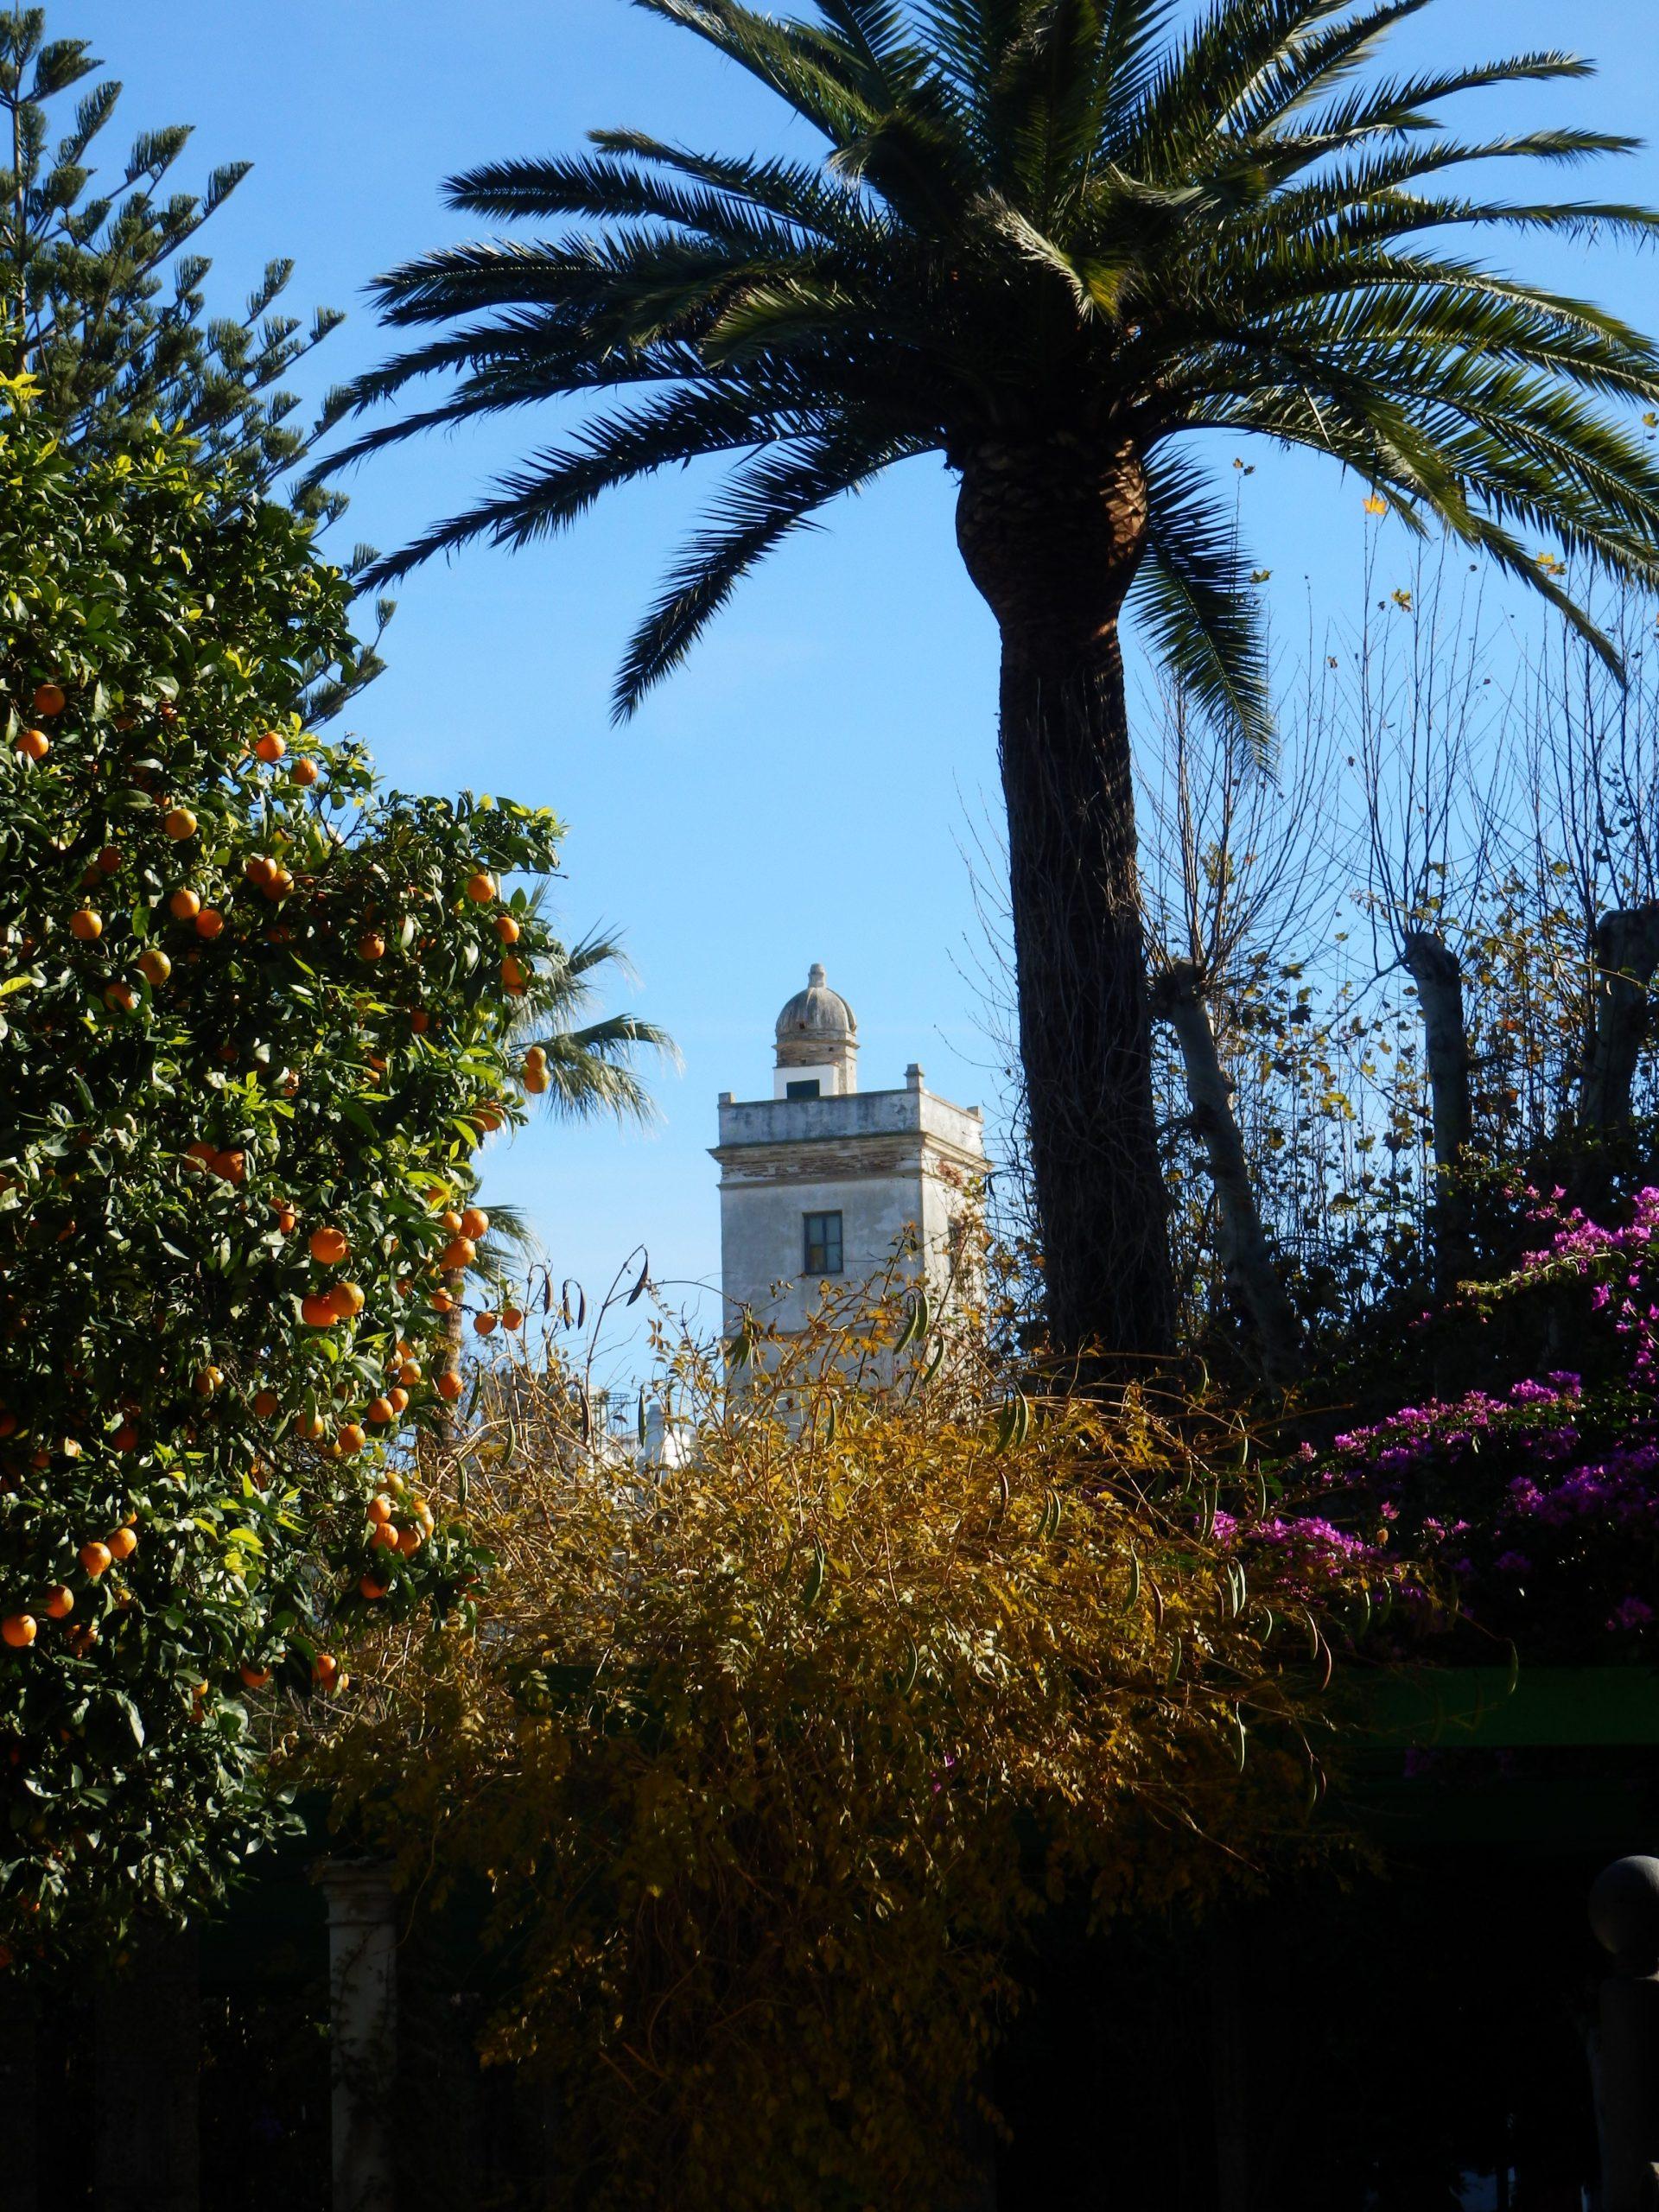 TOUR LEGENDS AND MYSTERIES OF CÁDIZ